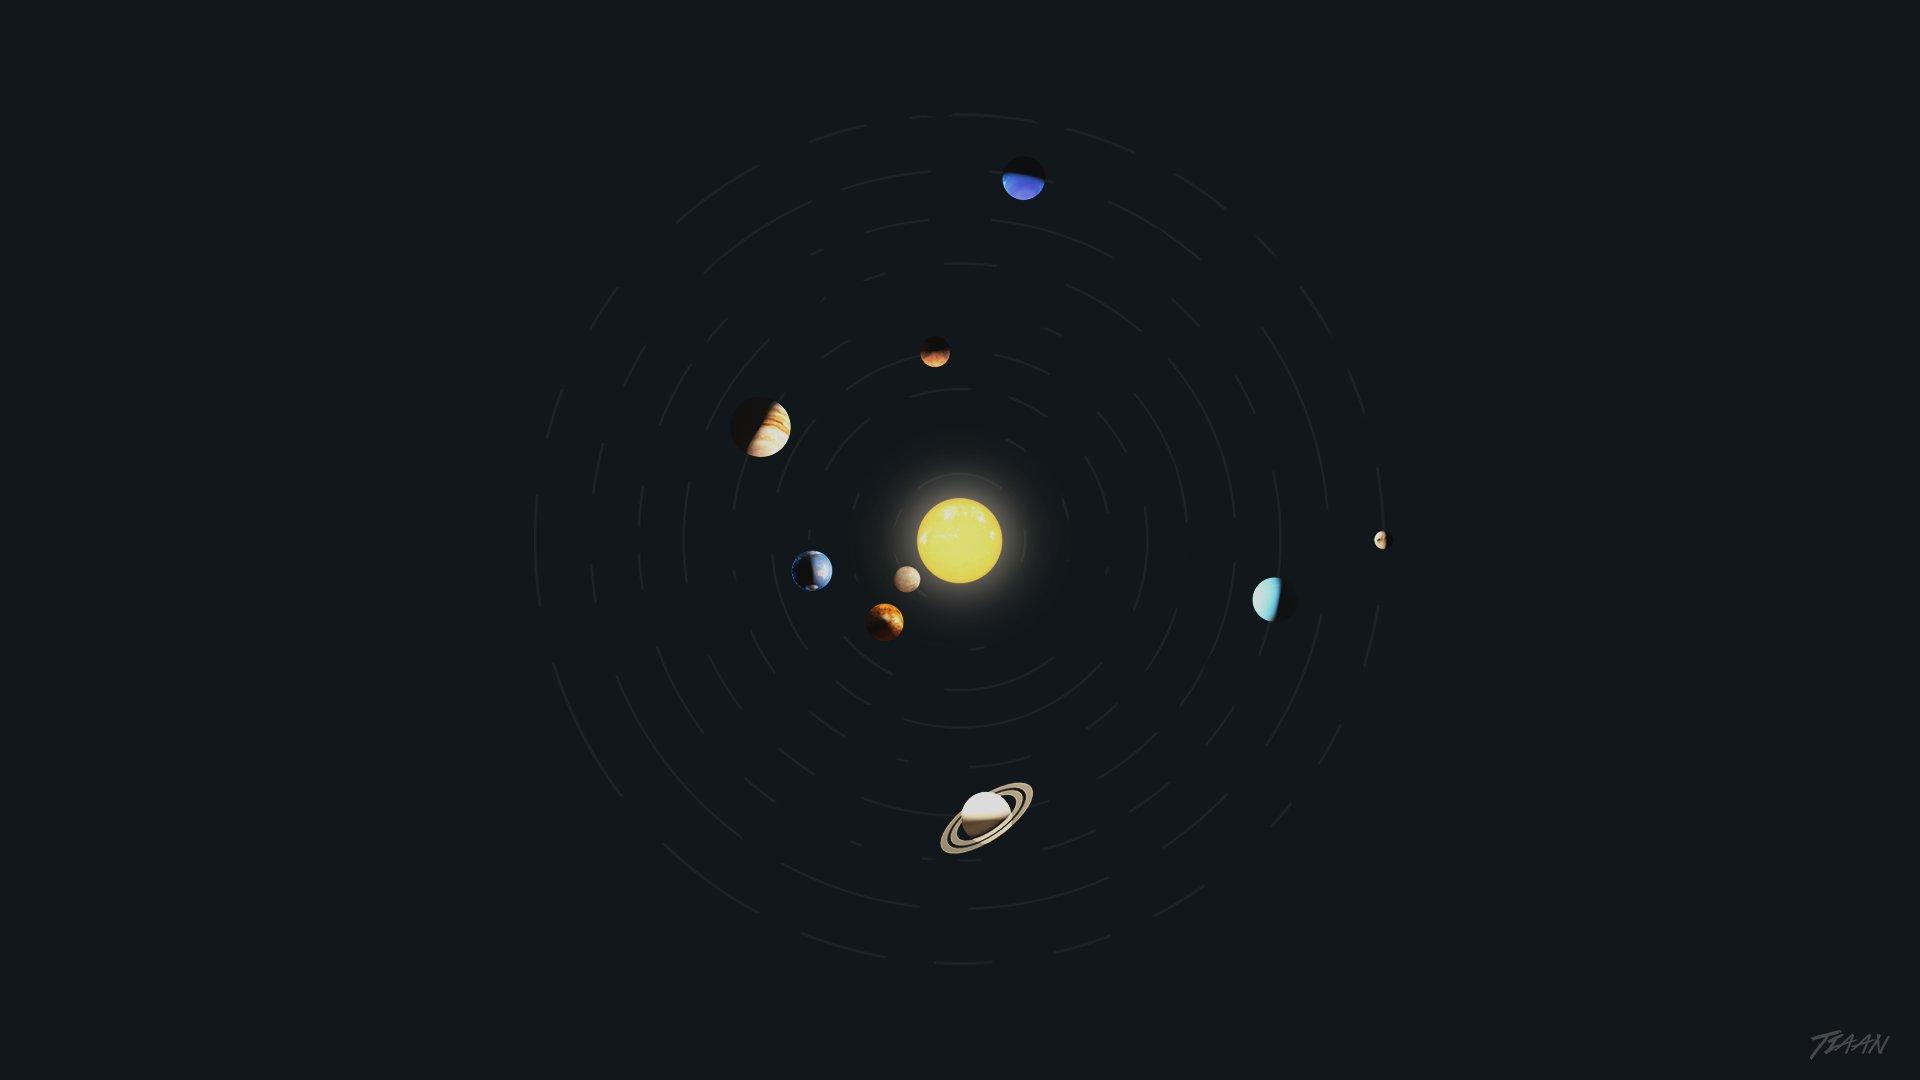 Solar System Minimalism Space Art Planet Adobe Photoshop